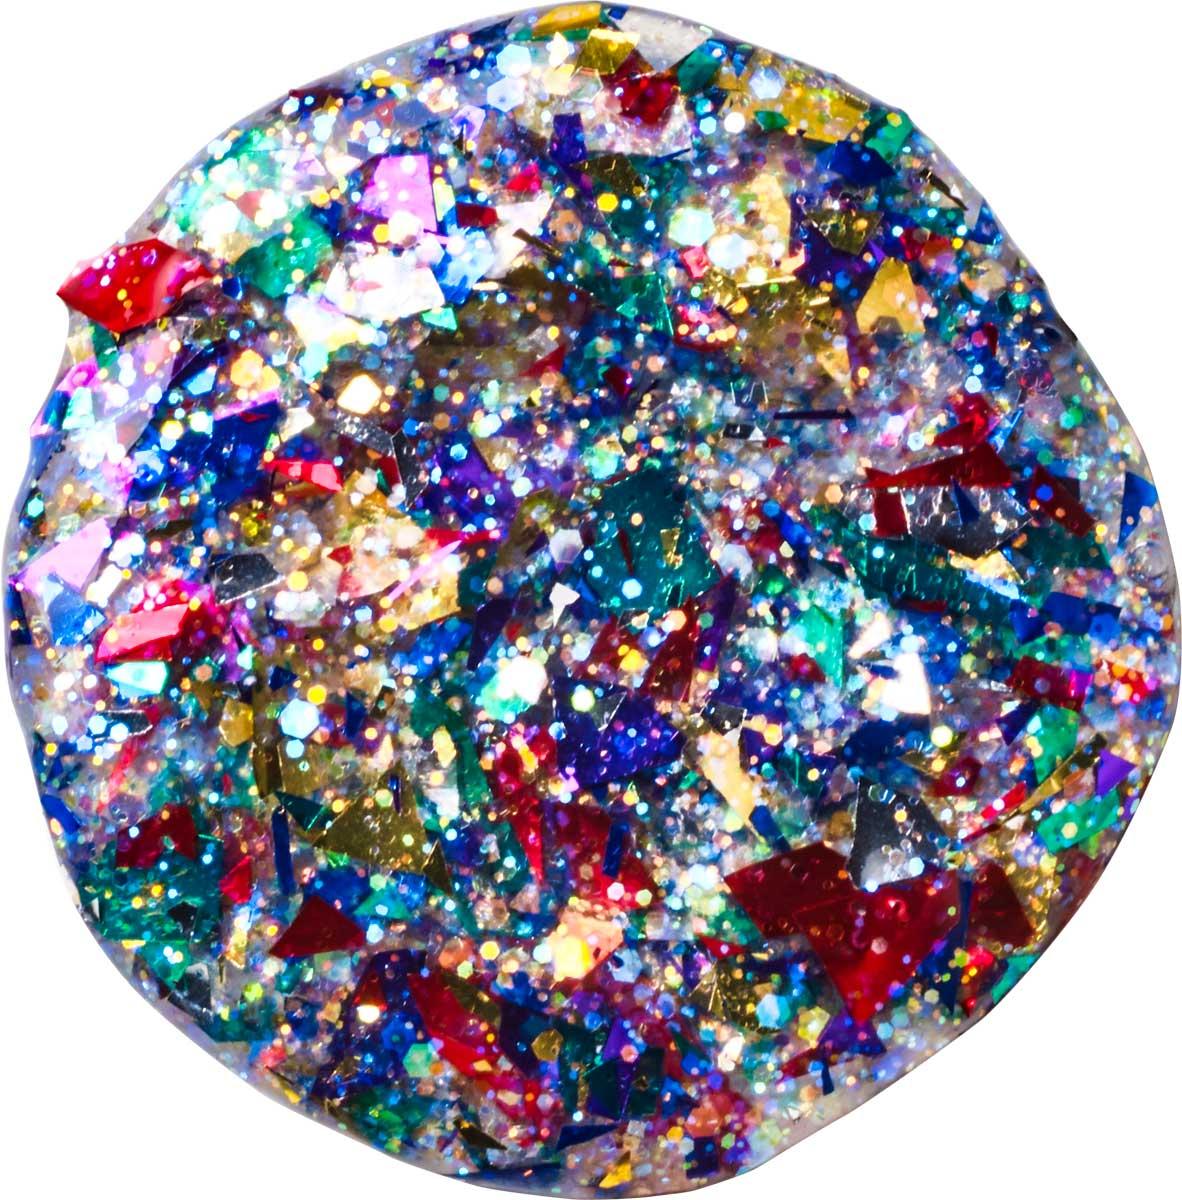 FolkArt ® Glitterific™ Acrylic Paint - Kaleidoscope, 2 oz.